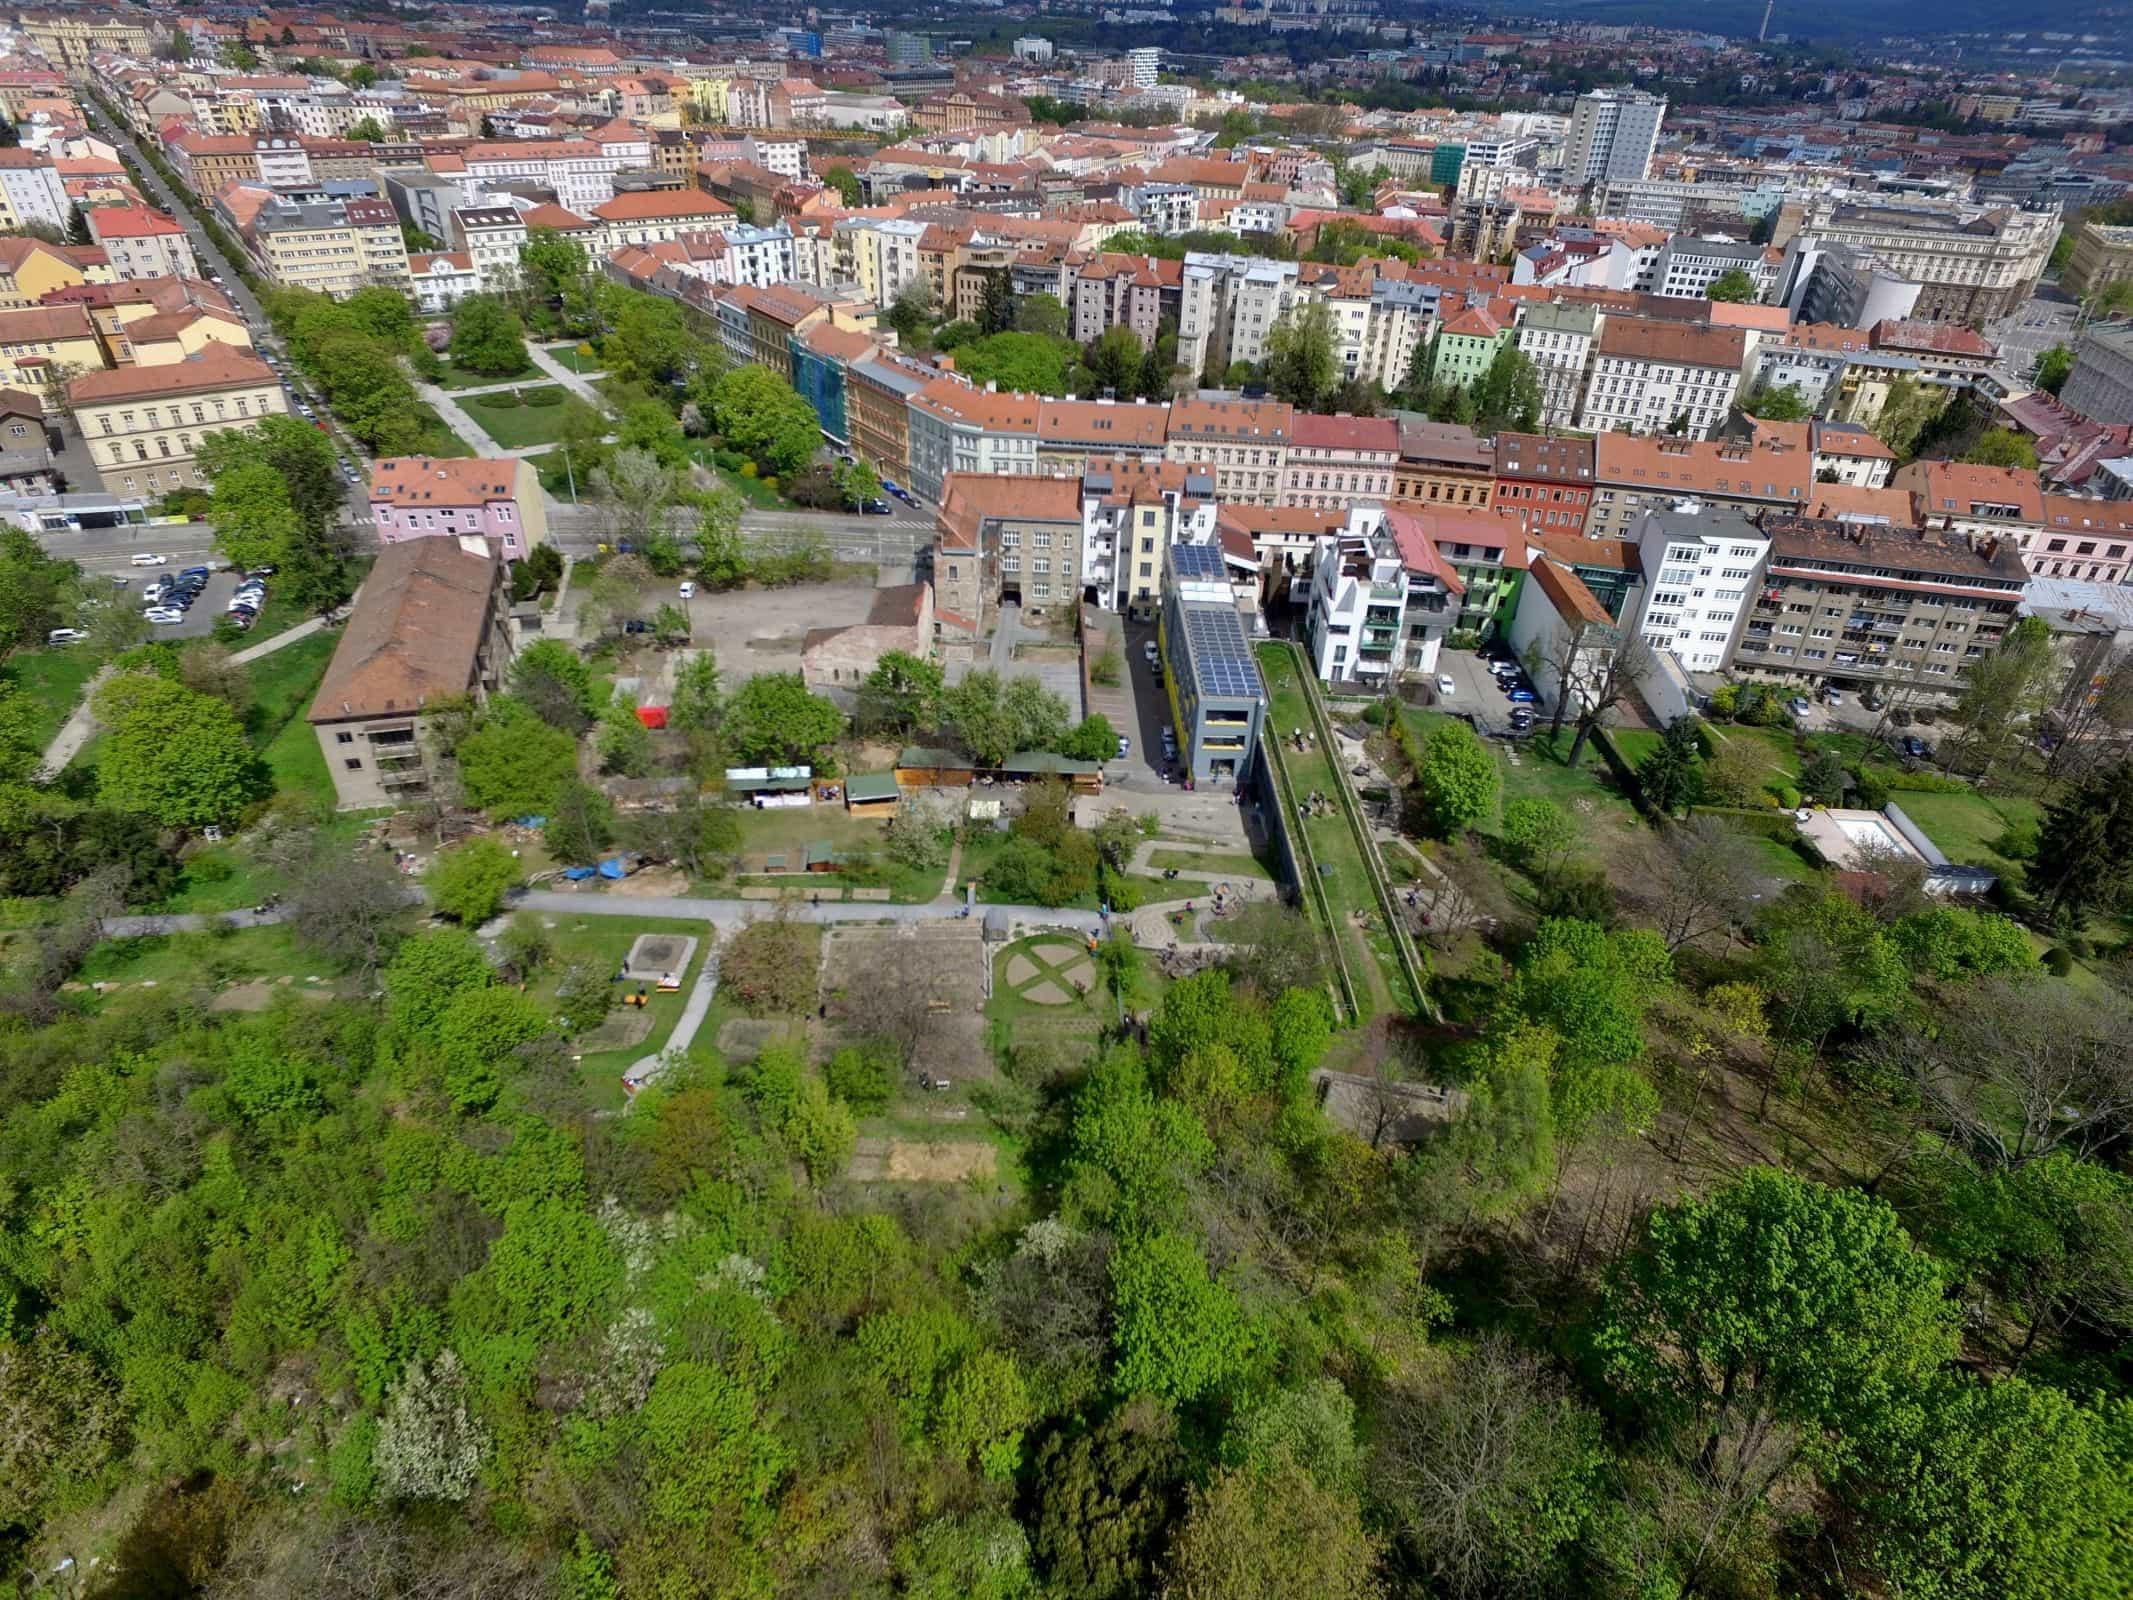 The Open Gardens in Brno